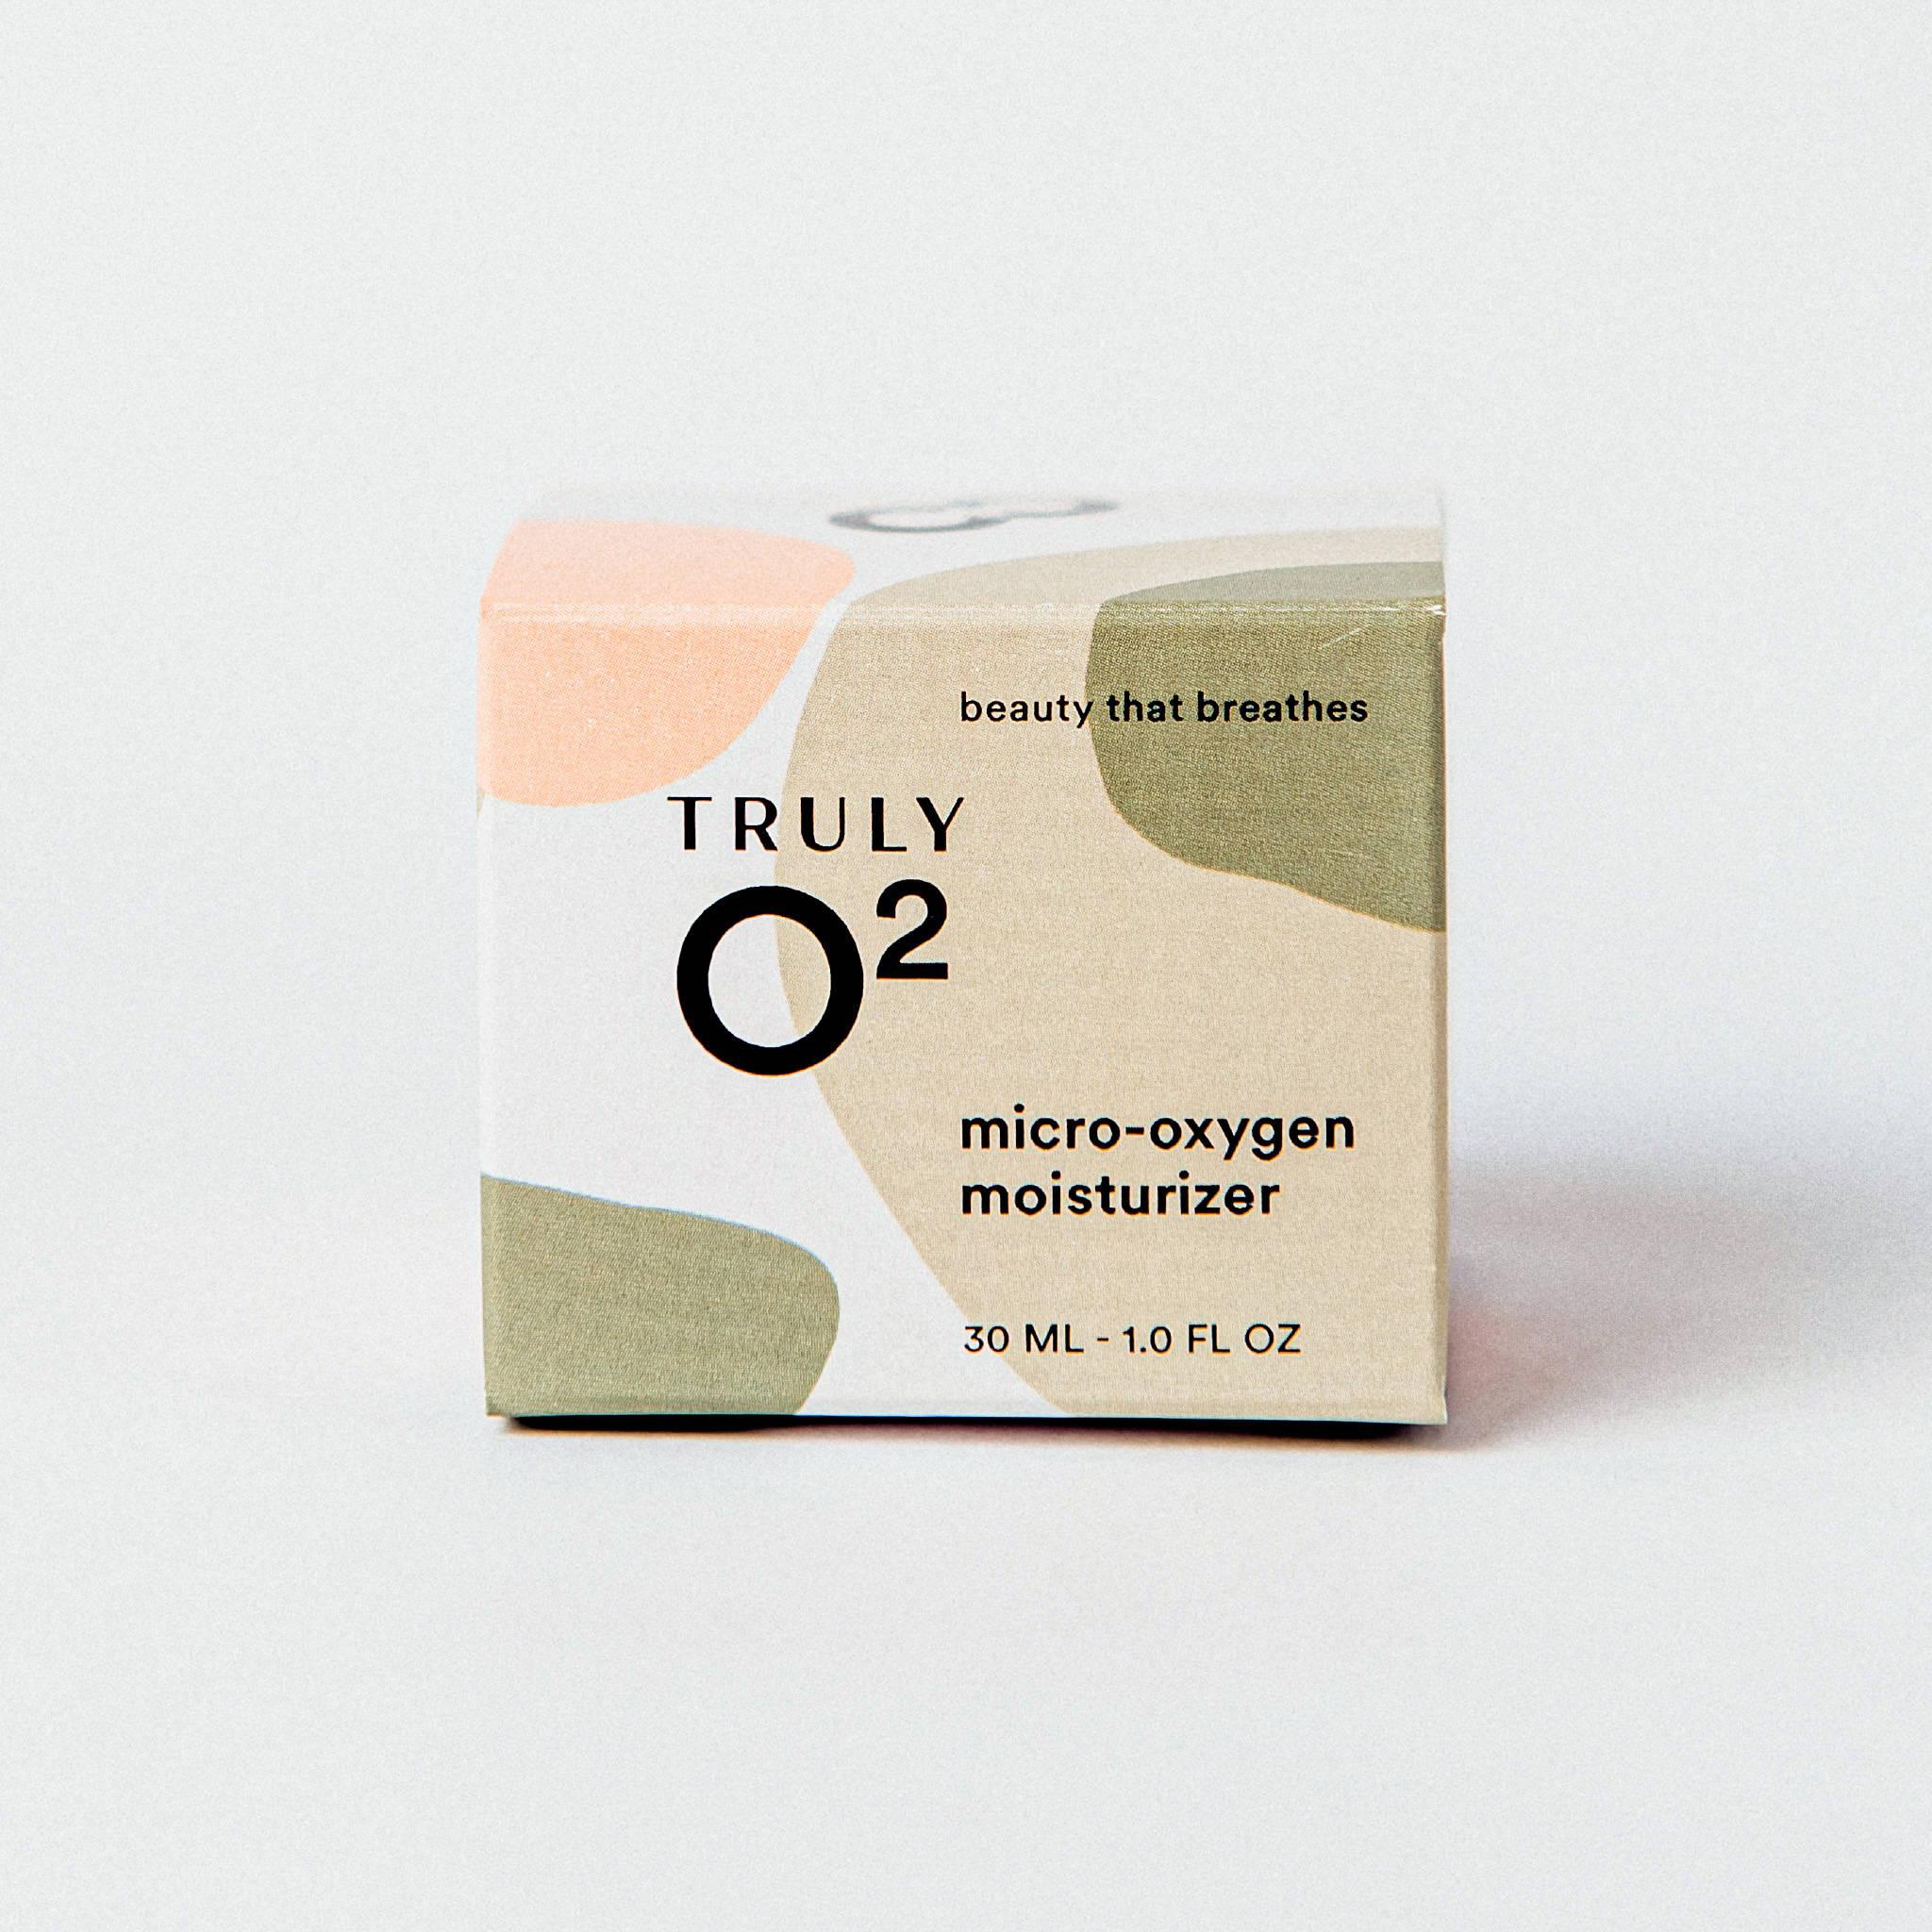 Truly O2 micro-oxygen moisturizer 1oz face cream box